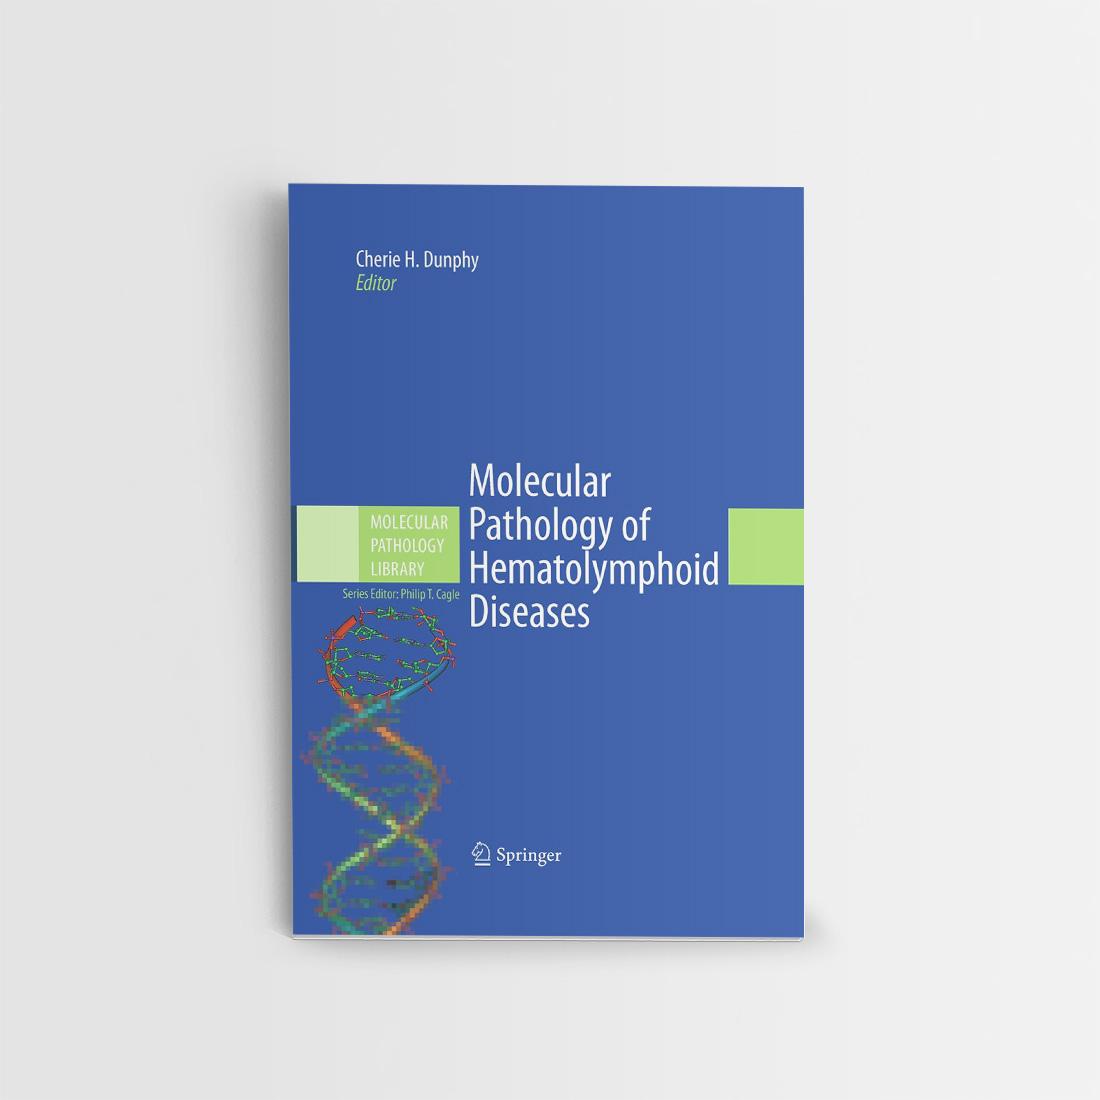 Molecular Pathology of Hematolymphoid Diseases: 4 (Molecular Pathology Library)